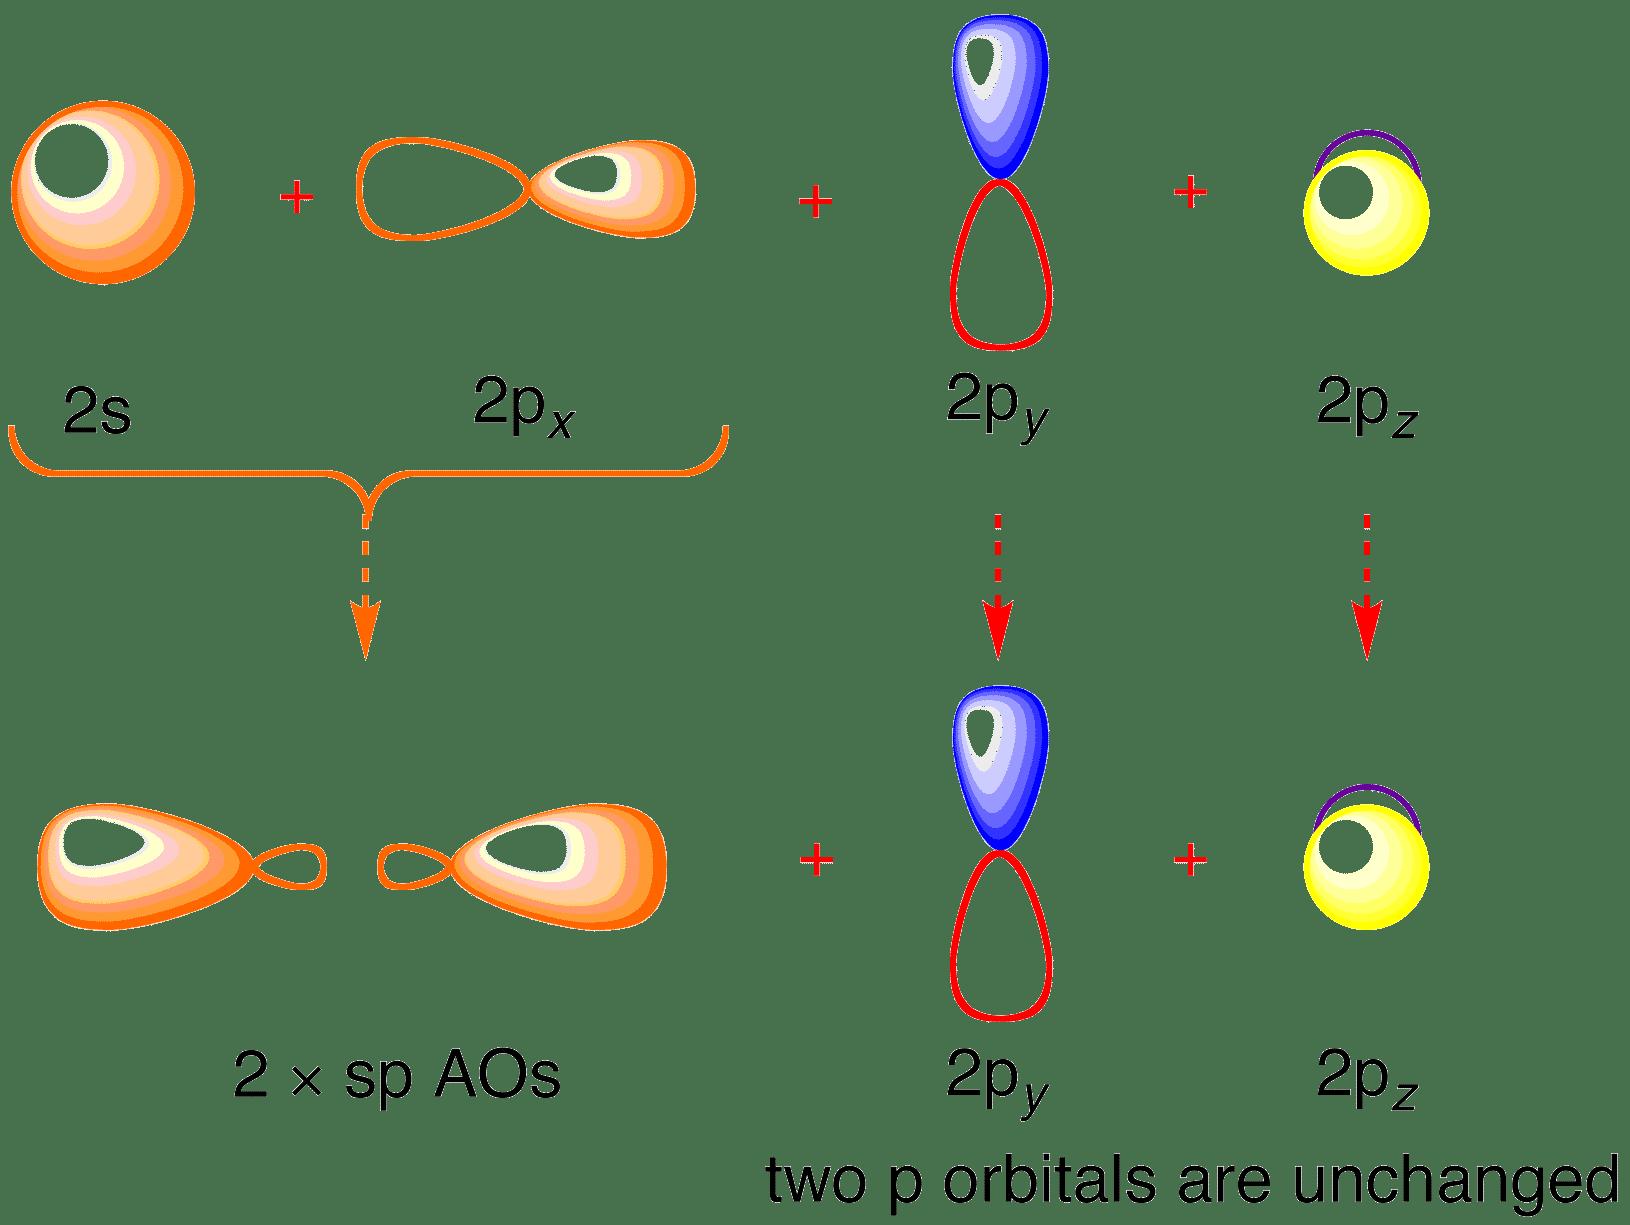 cn molecular orbital diagram wiring for whirlpool washing machine of acetylene theory bonding